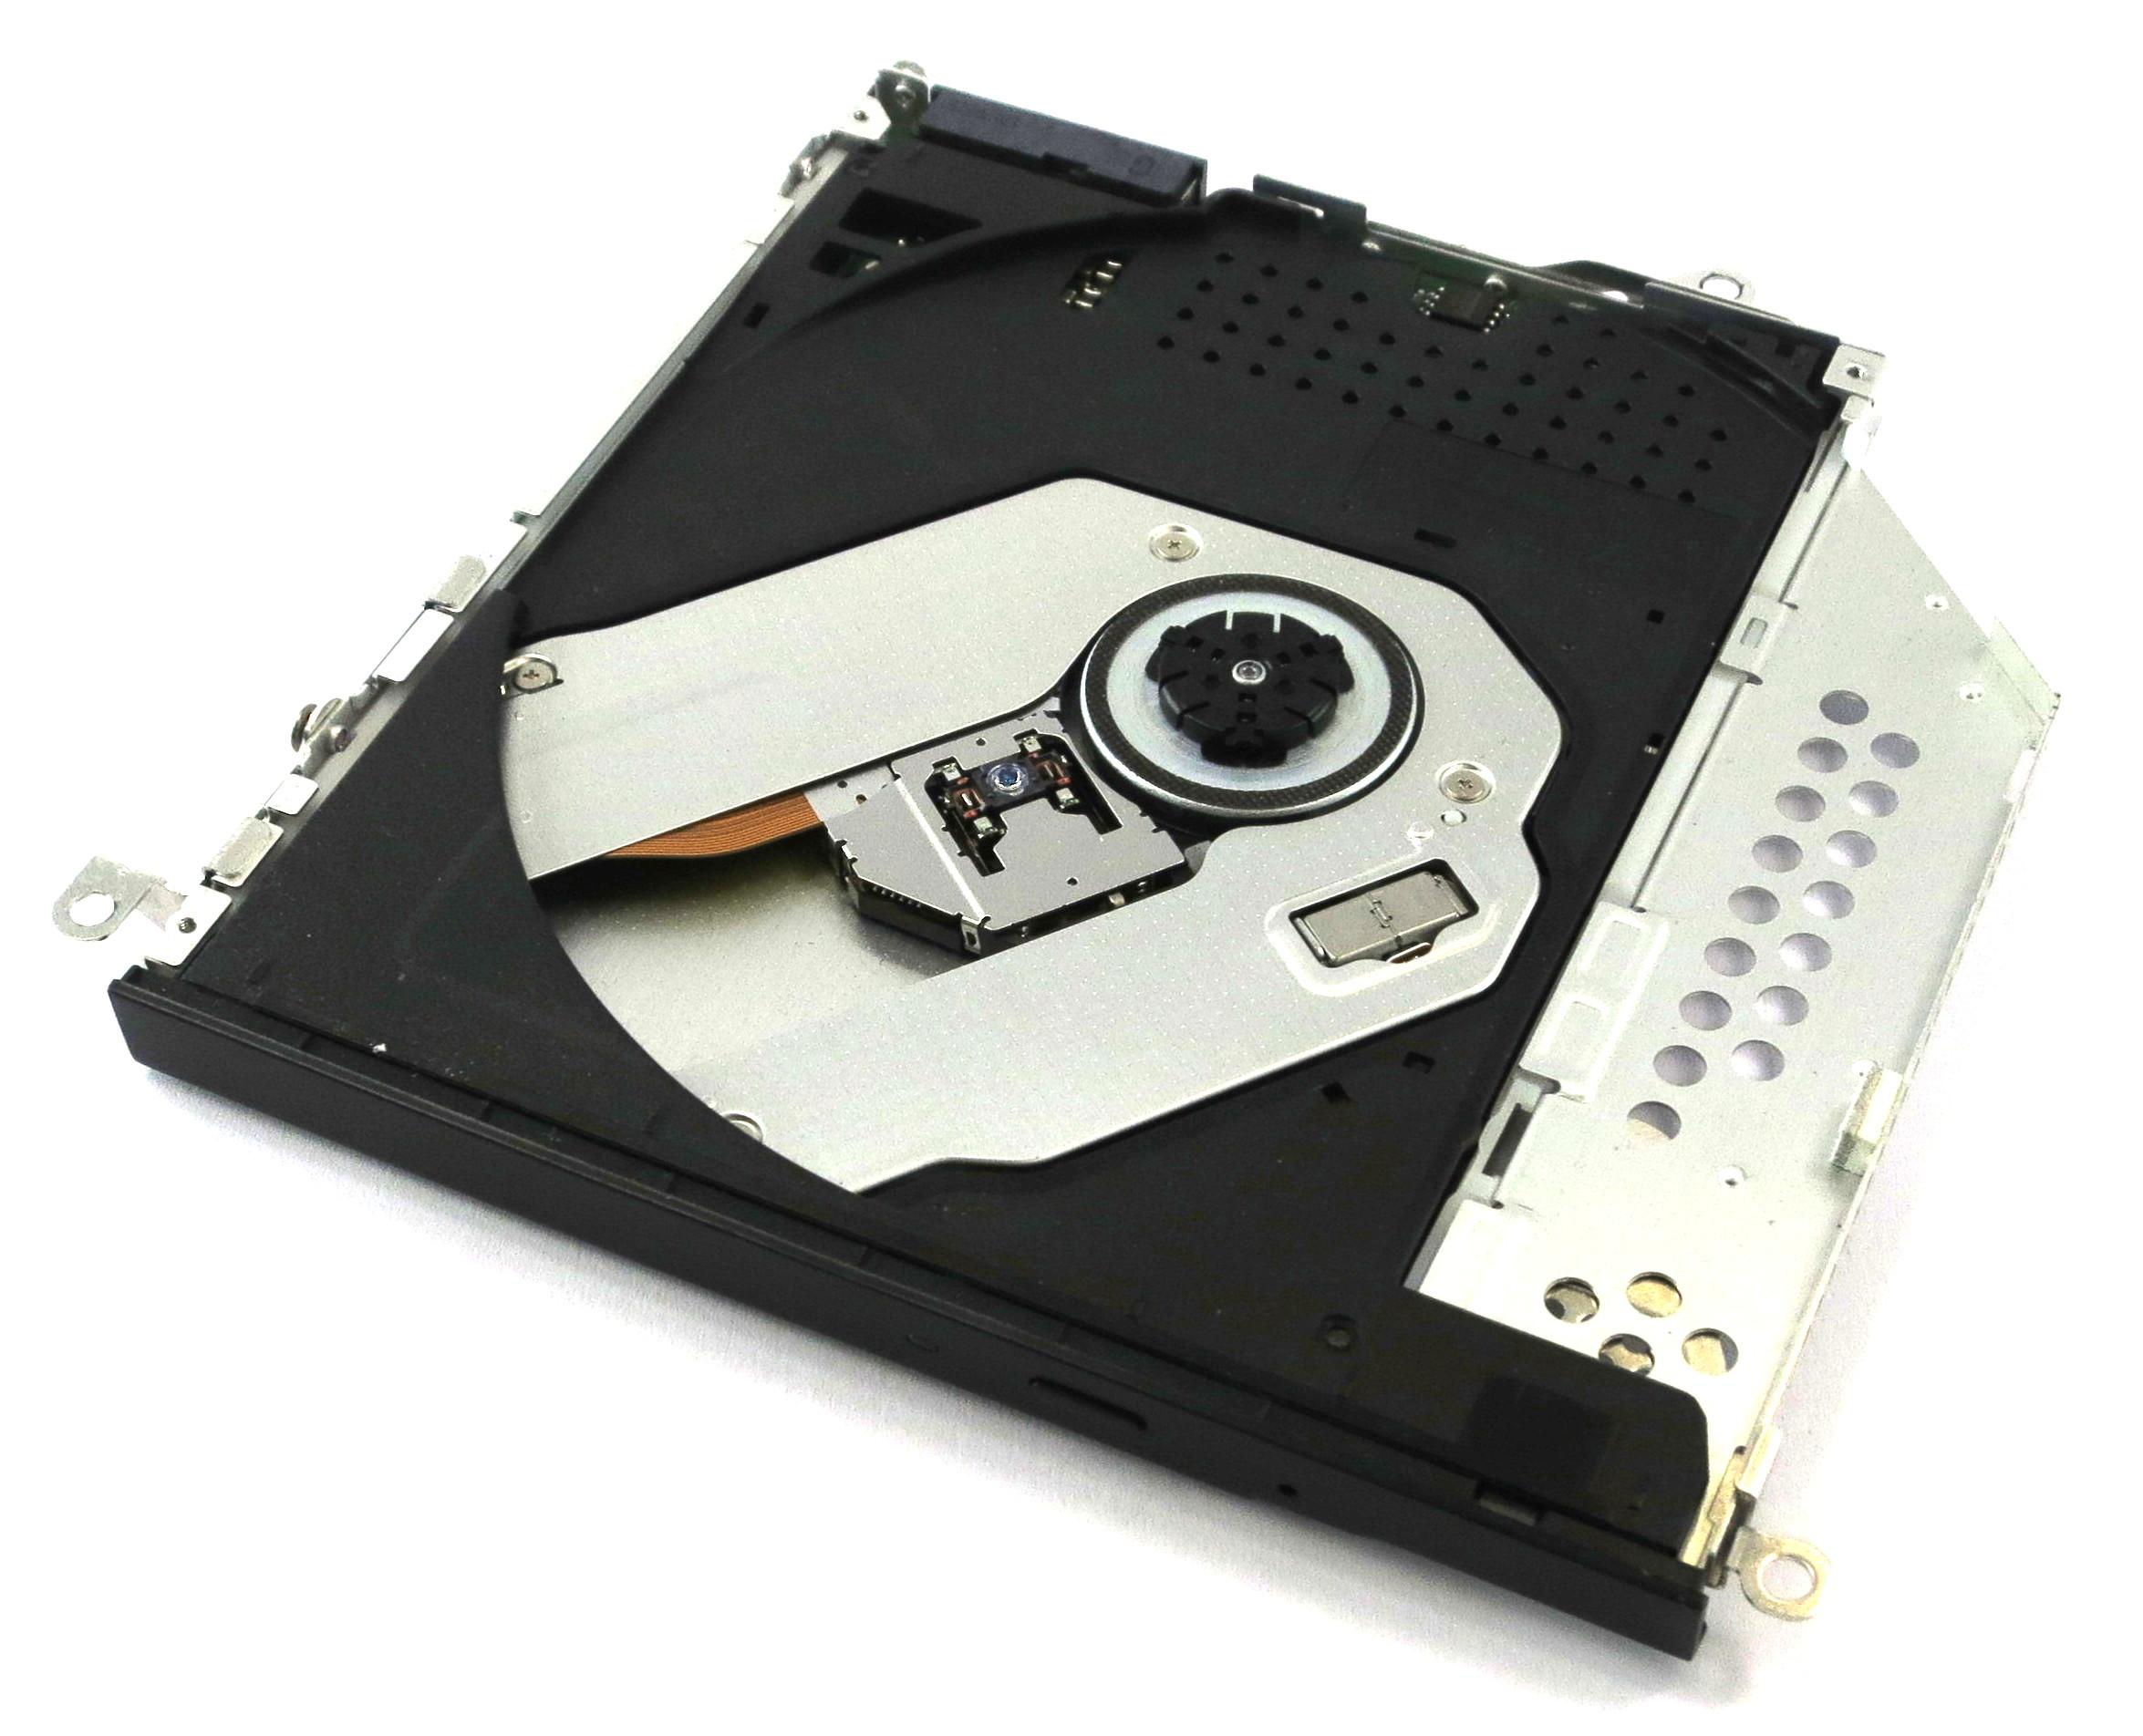 Toshiba G8CC0005TZ30 Portege R830 DVD+/-RW Drive - UJ8C2 ABTJ3-T